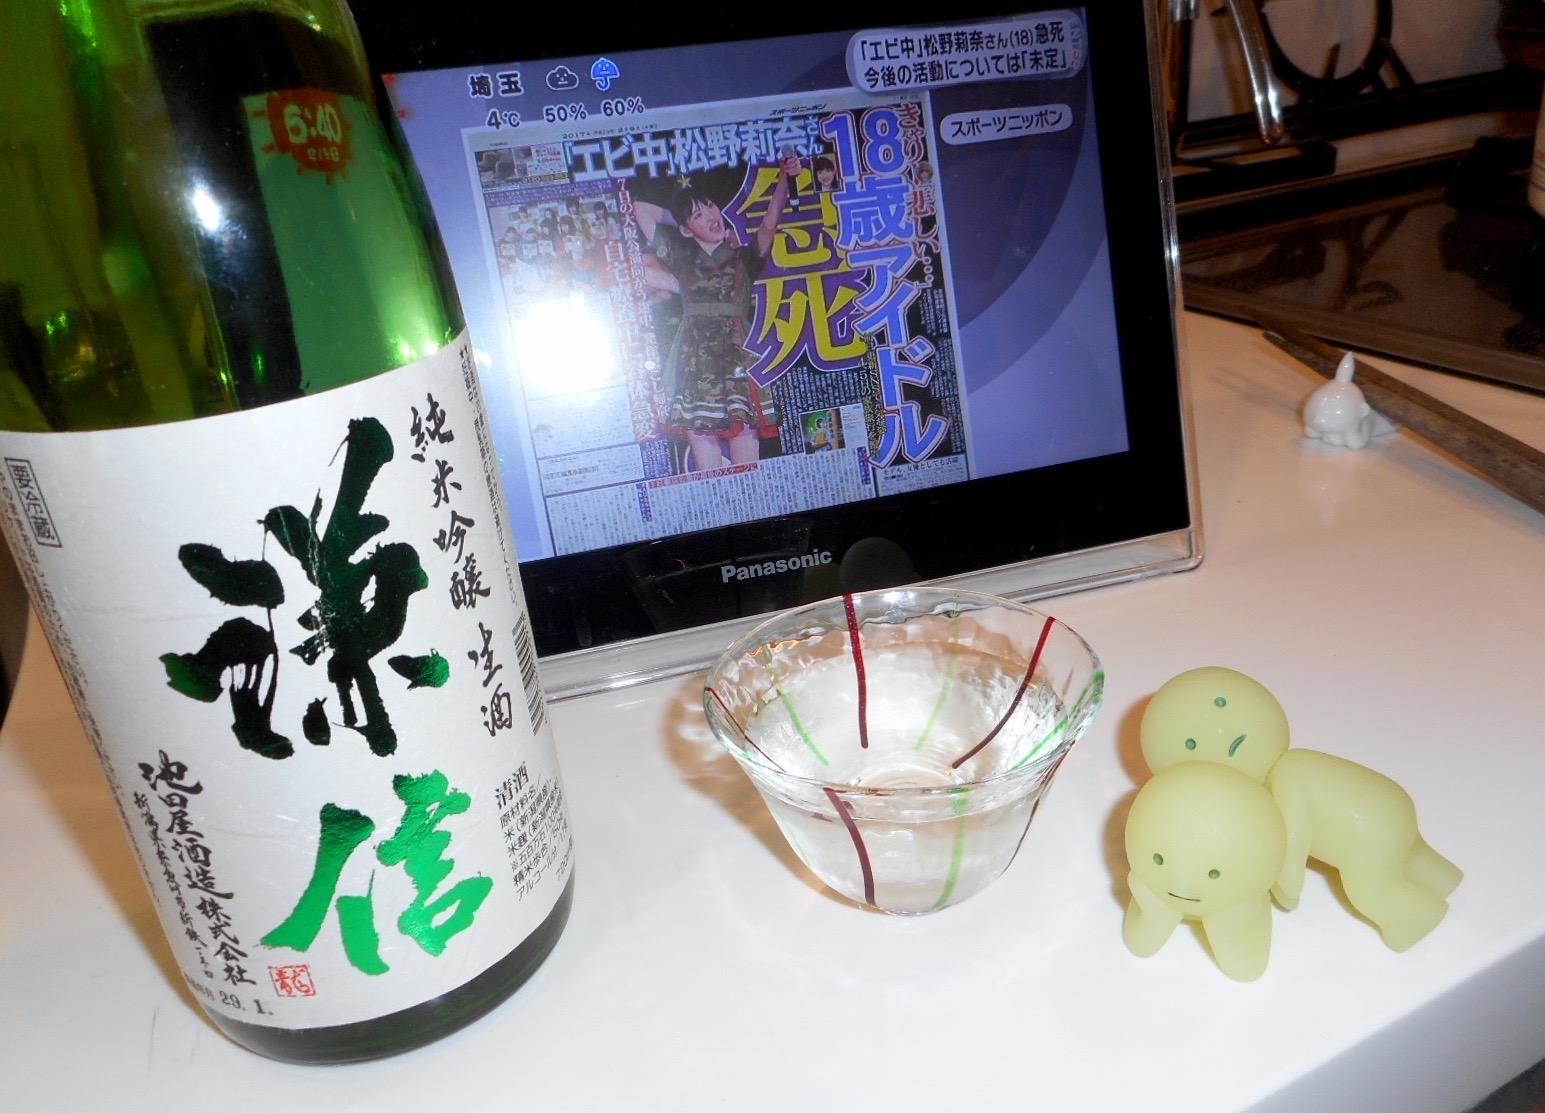 kenshin_jungin_gohyaku_nama28by9.jpg